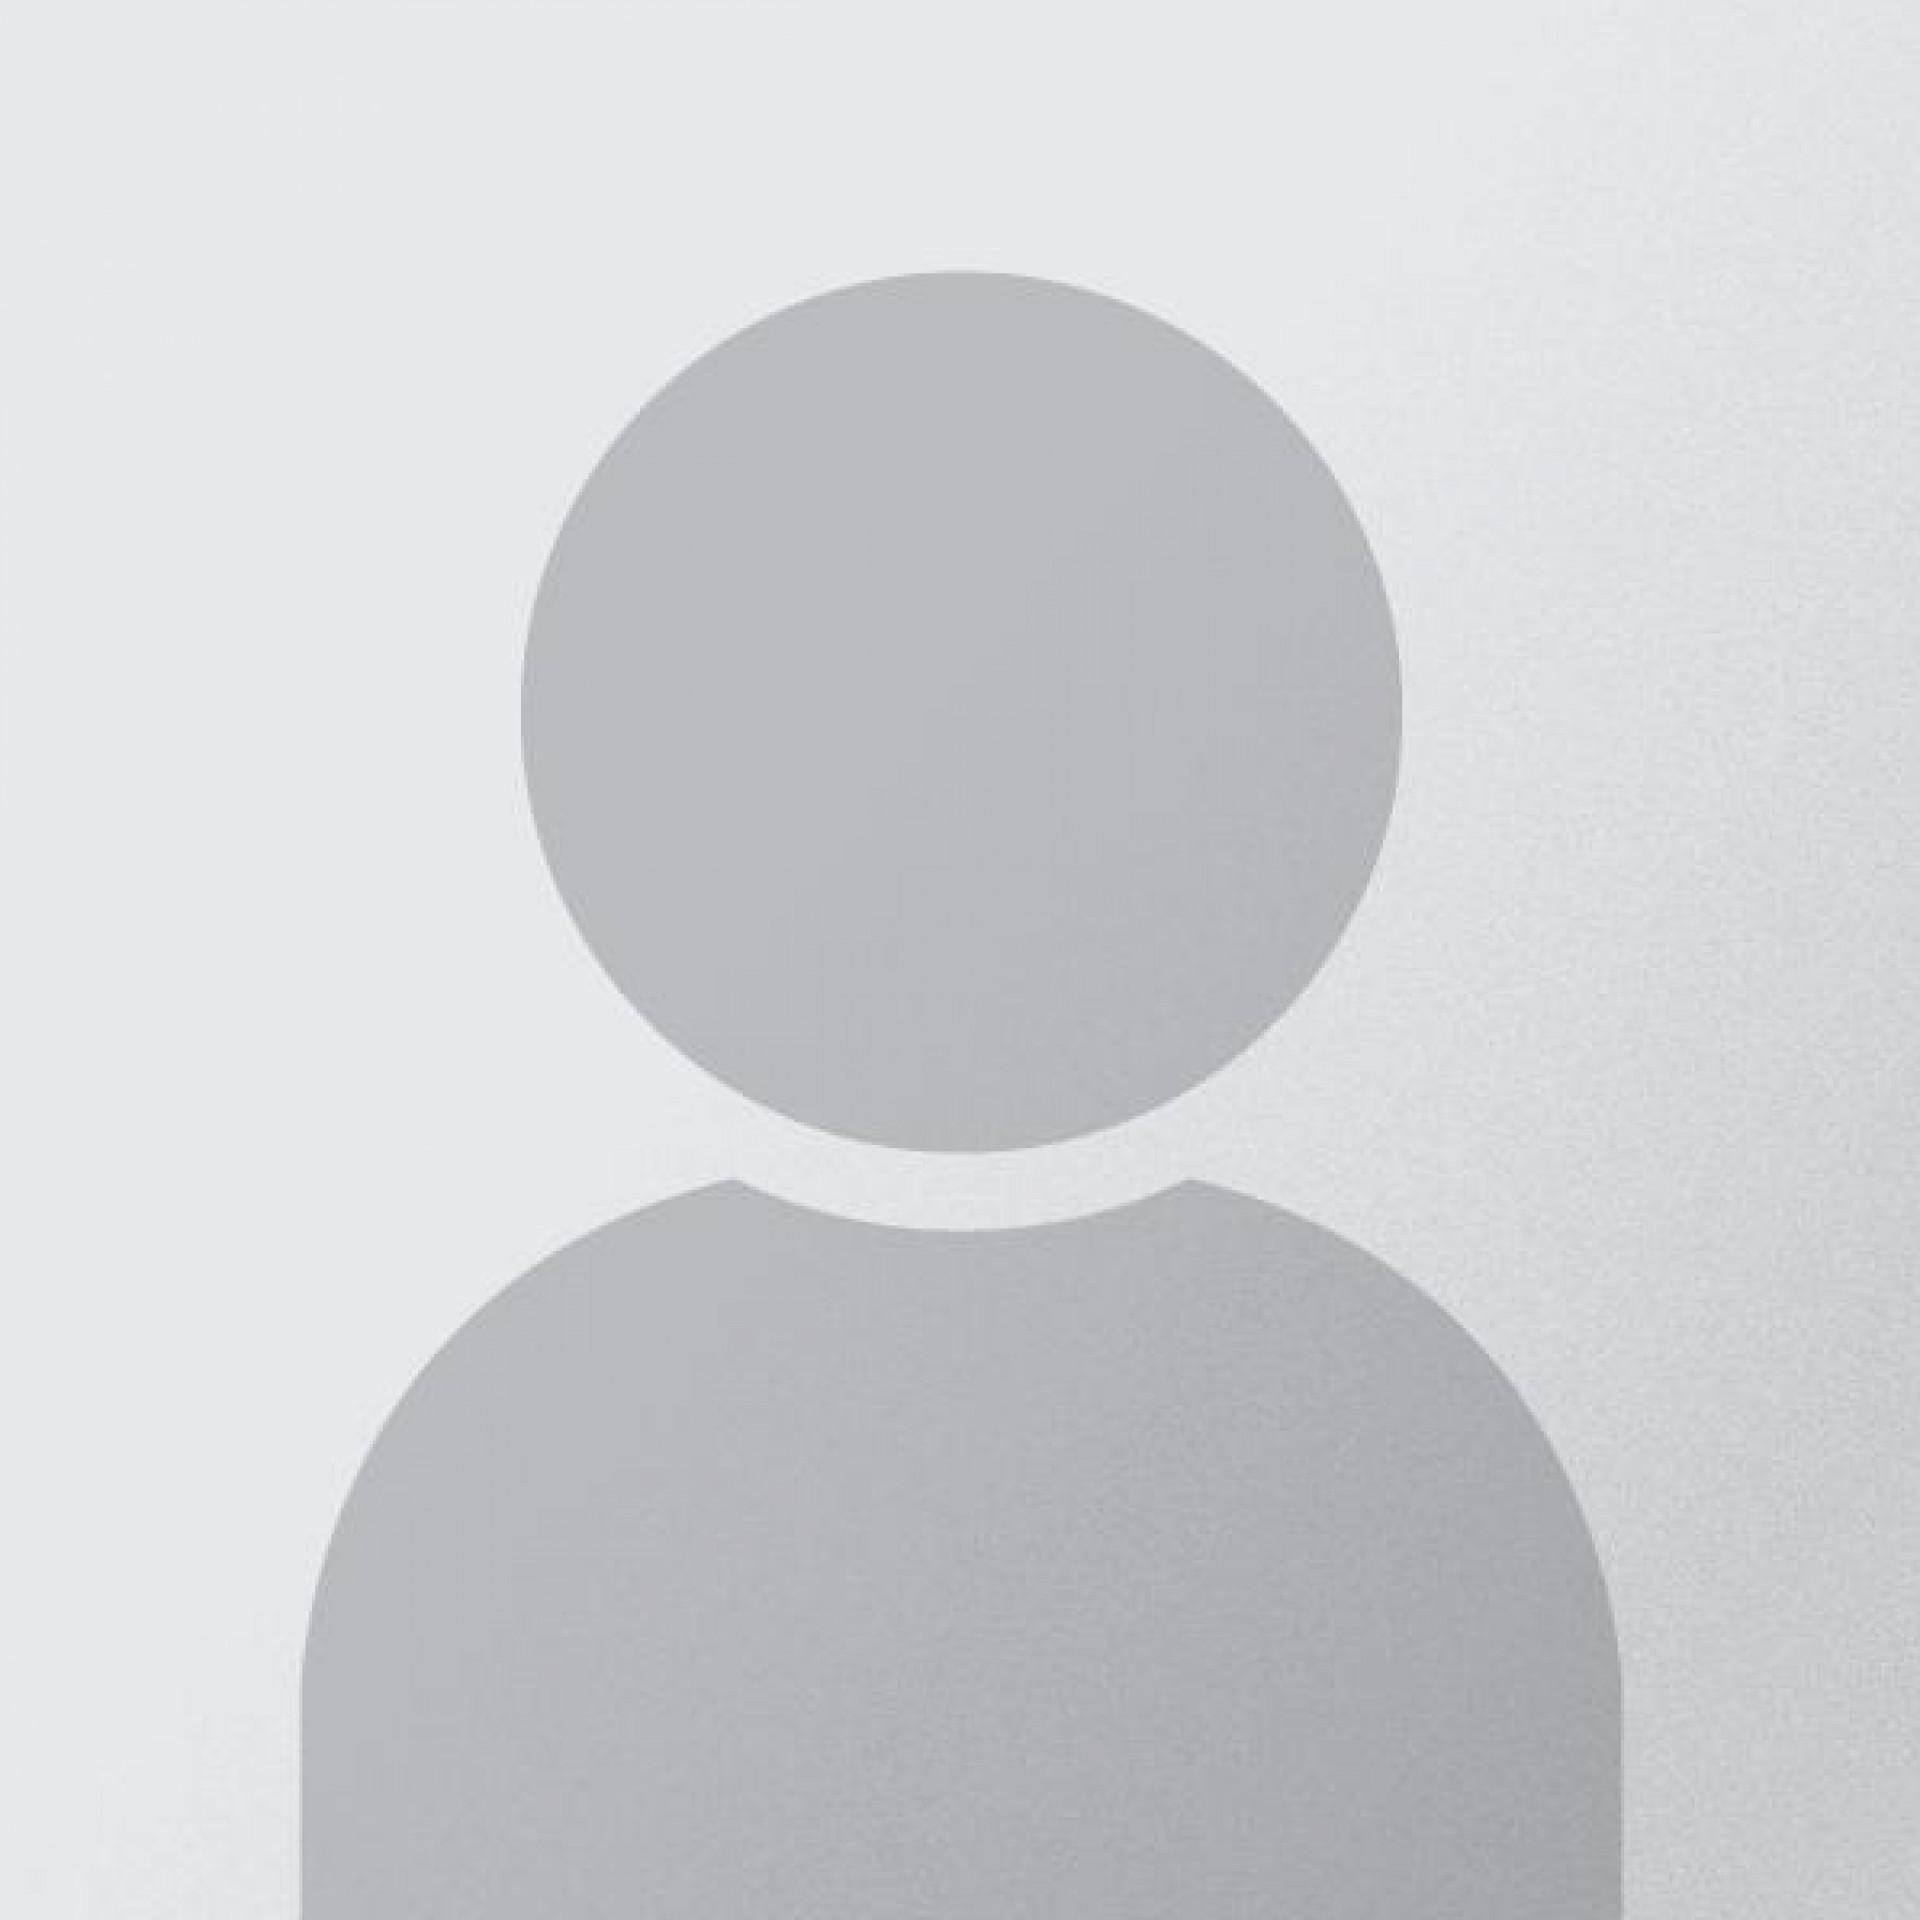 fotografia p031 profilu 0102Q4Z4KG